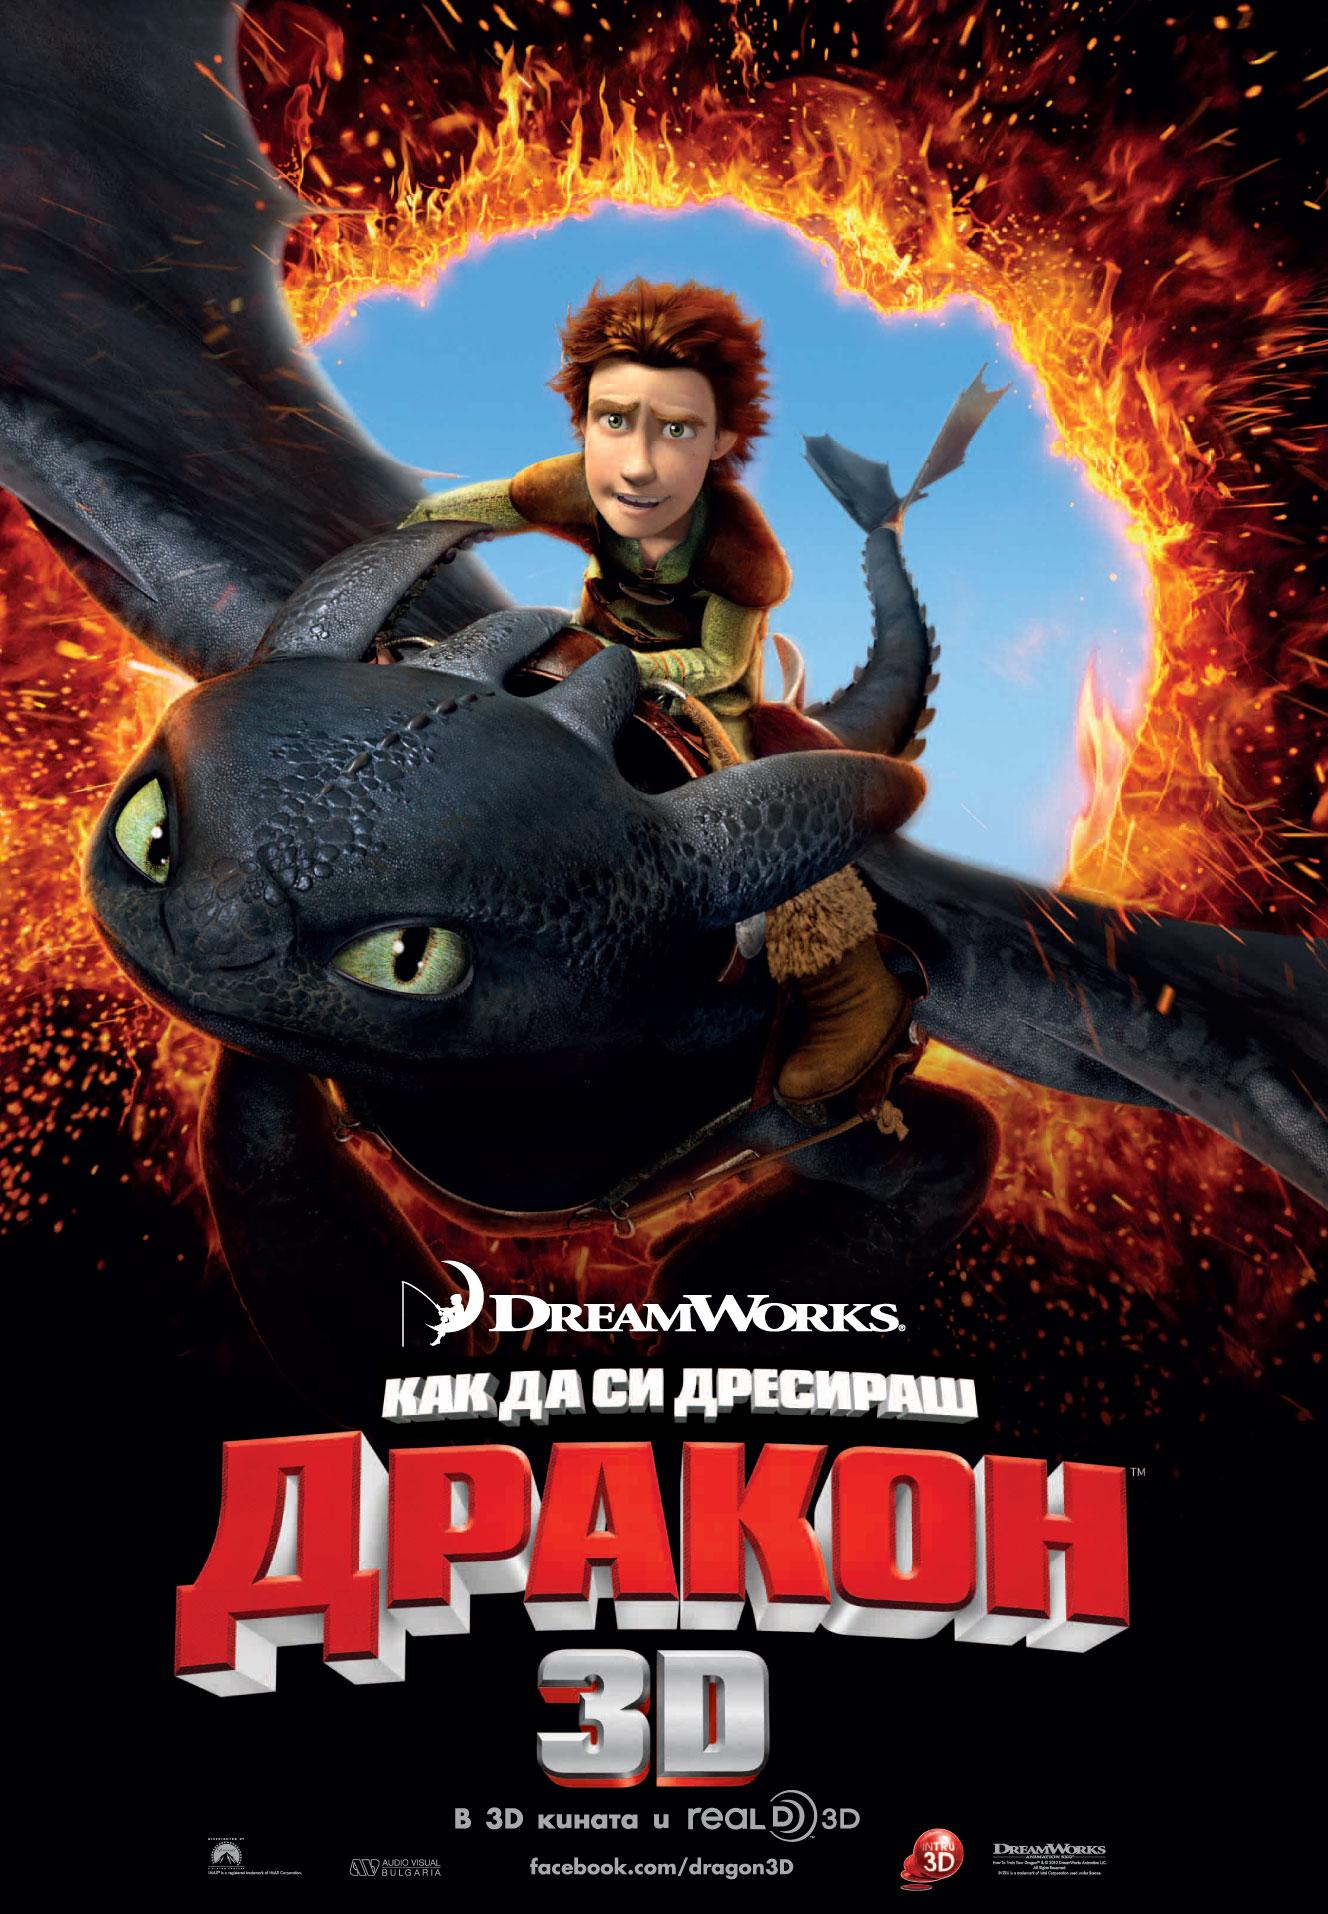 How to Train Your Dragon / Как да си дресираш дракон (2010)